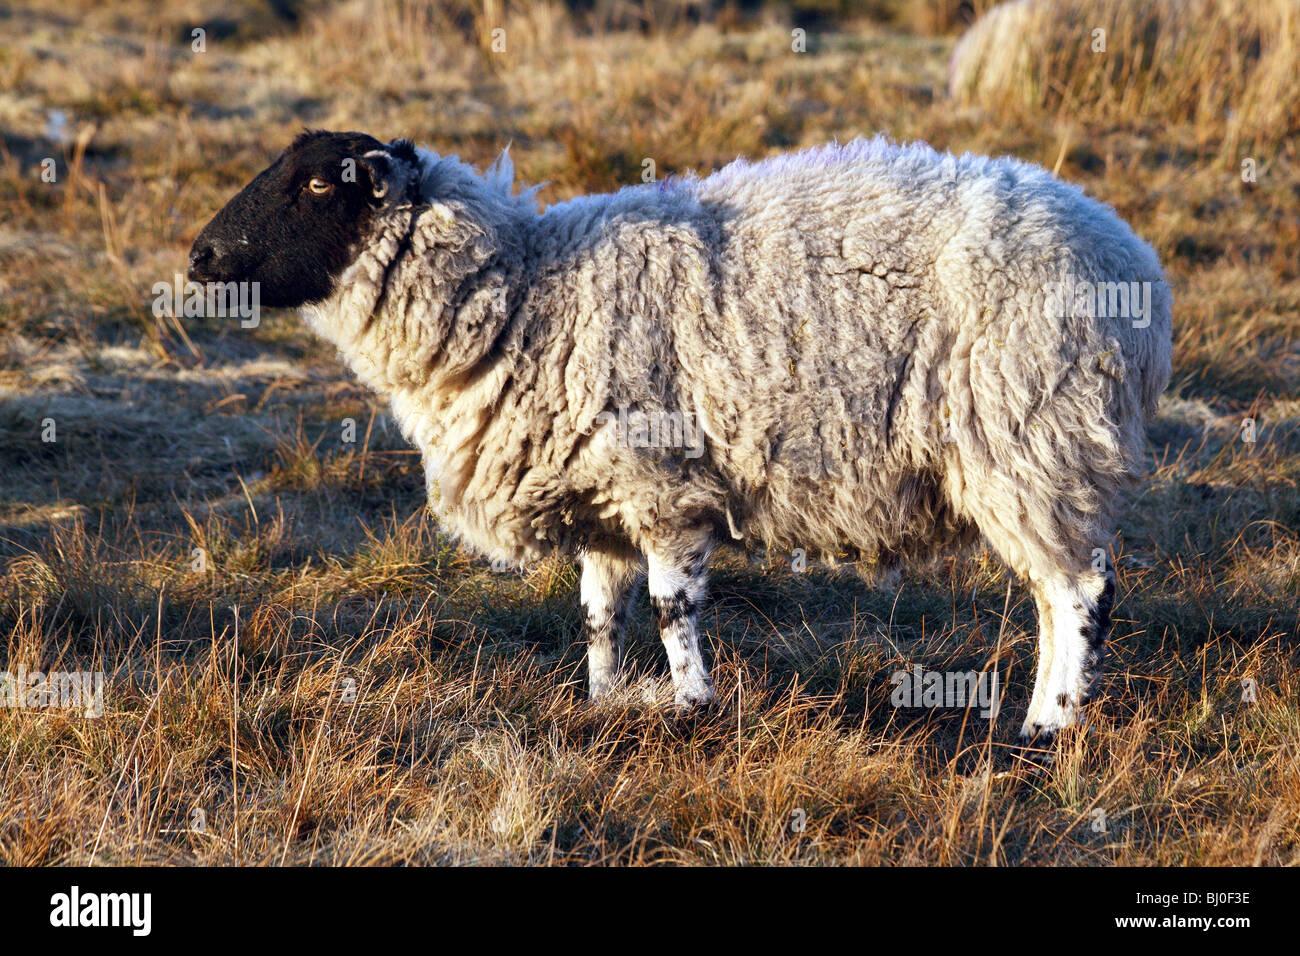 Sheep Breeds Derbyshire Gritstone Sheep a domestic farm